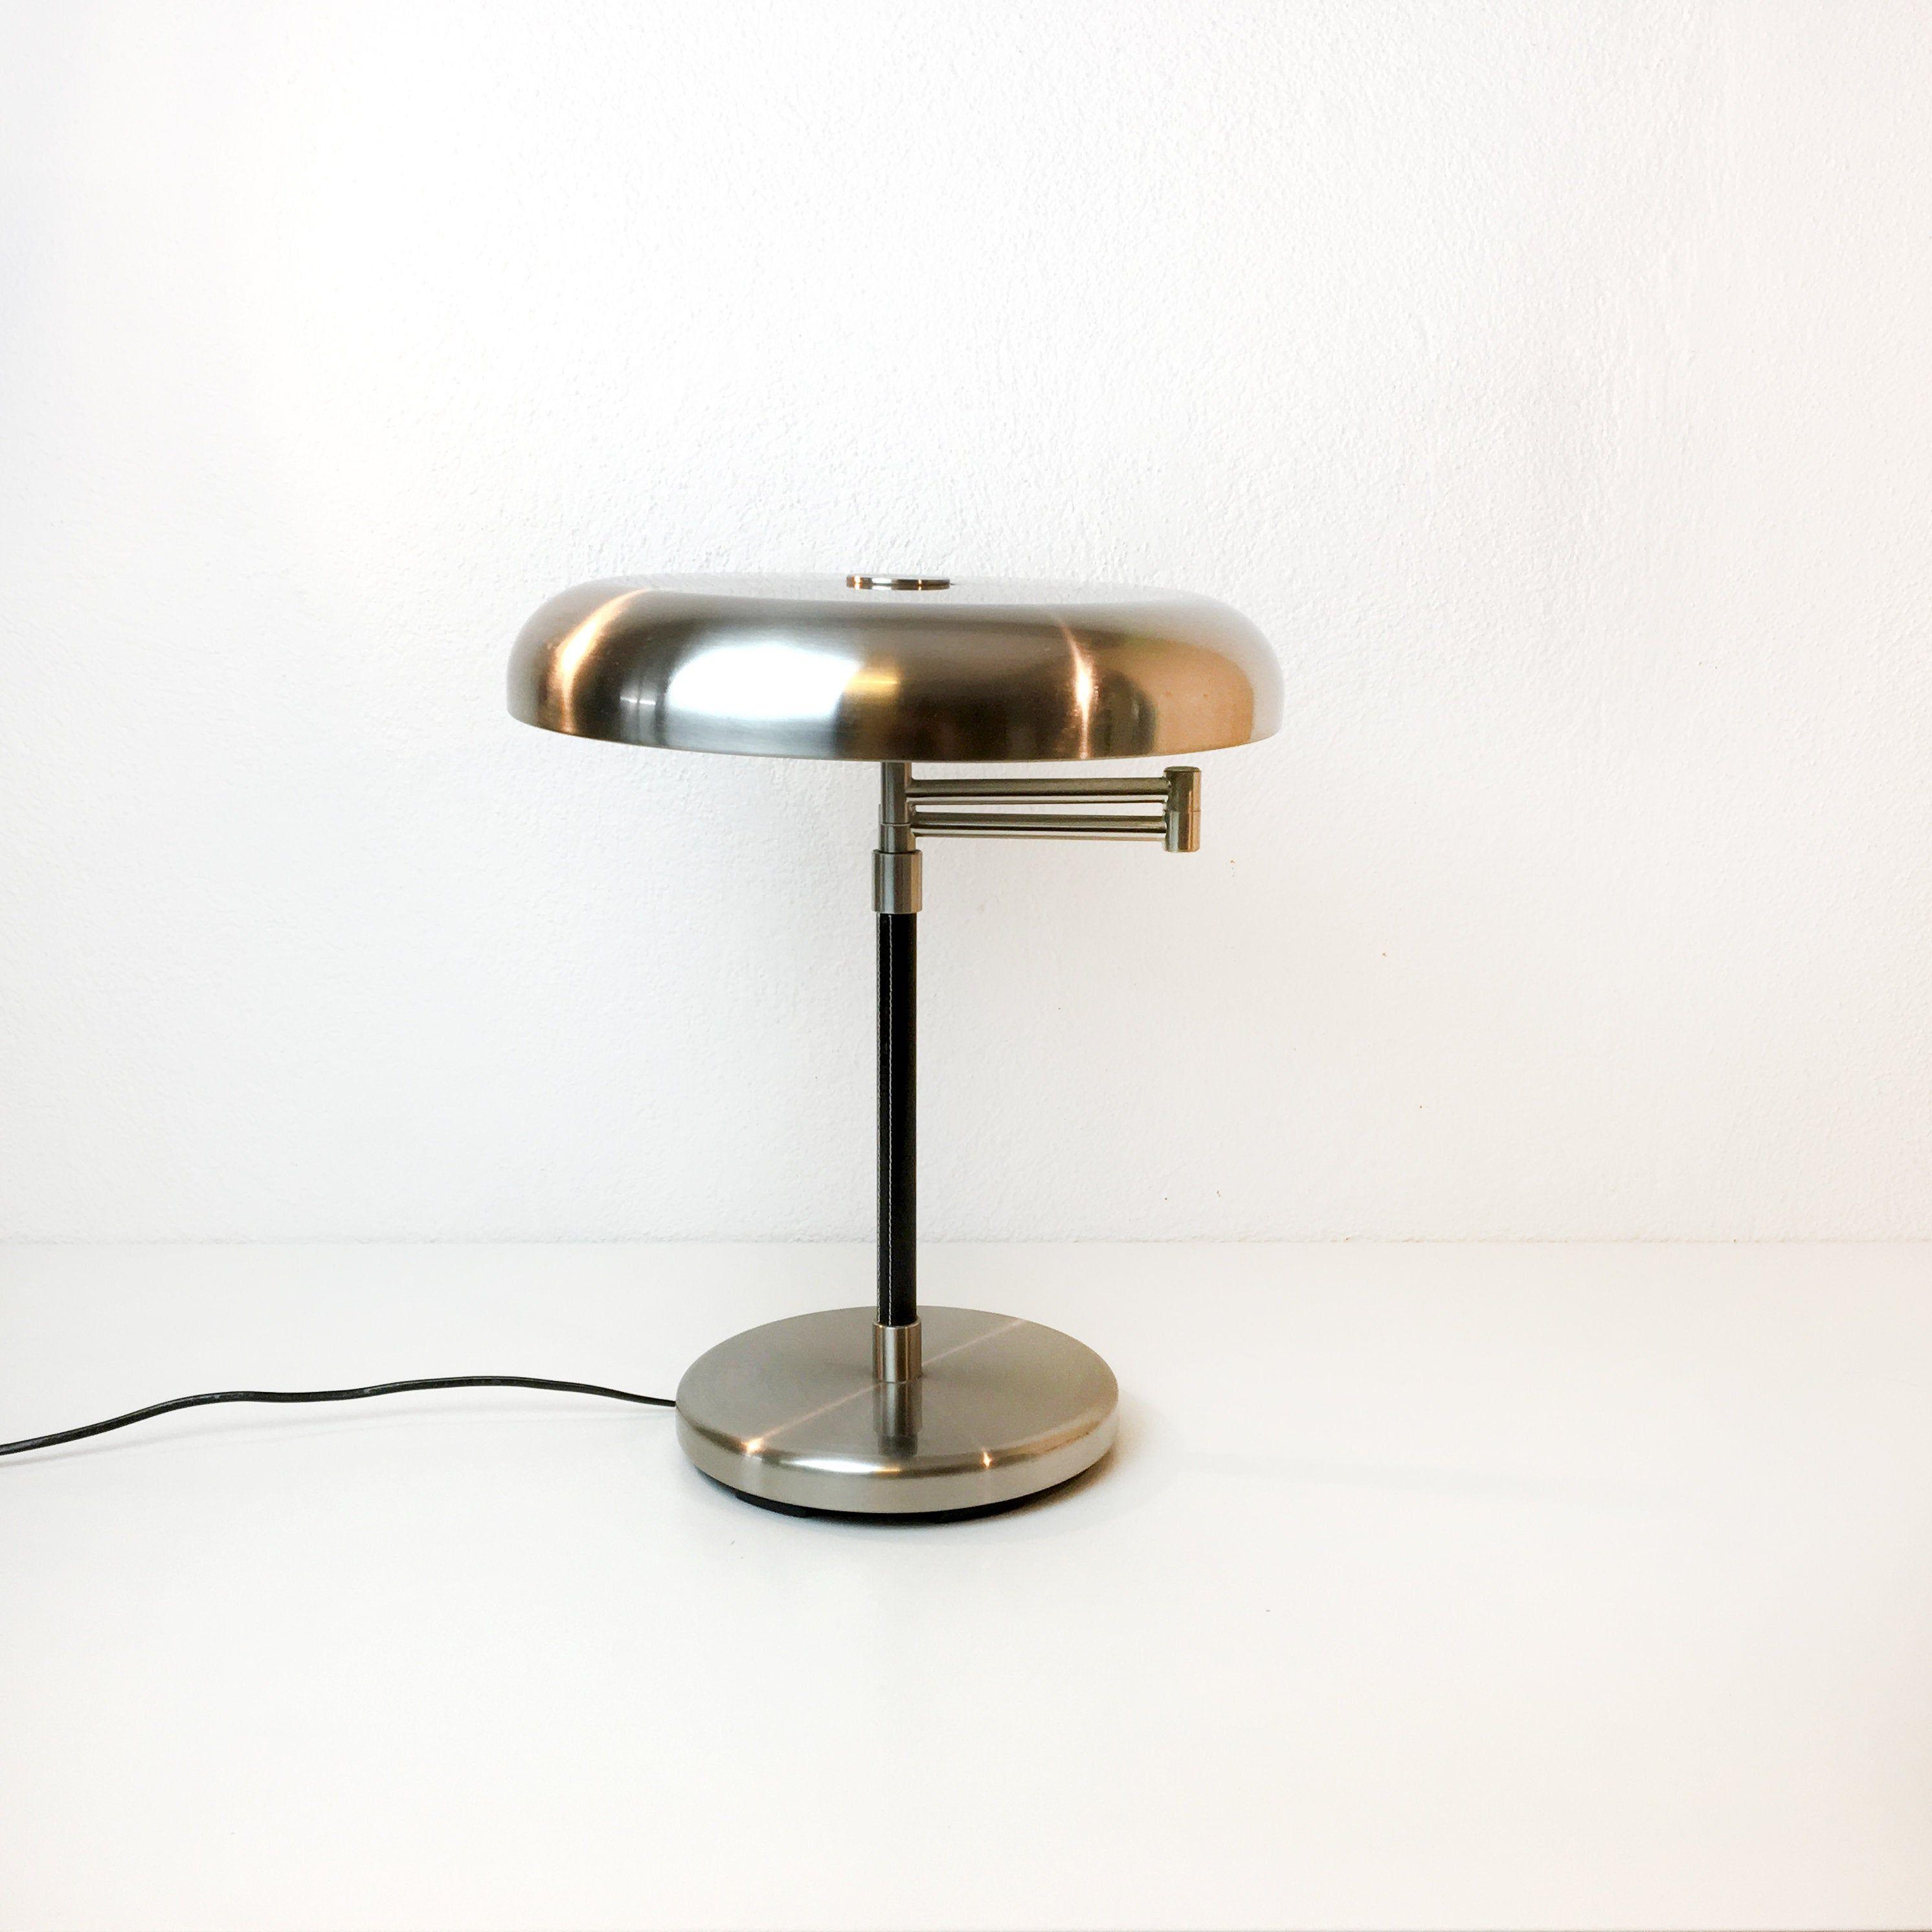 Vintage Ikea Tischlampe Schreibtischlampe Chrom Art Deco Etsy Desk Lamp Lamp Table Lamp